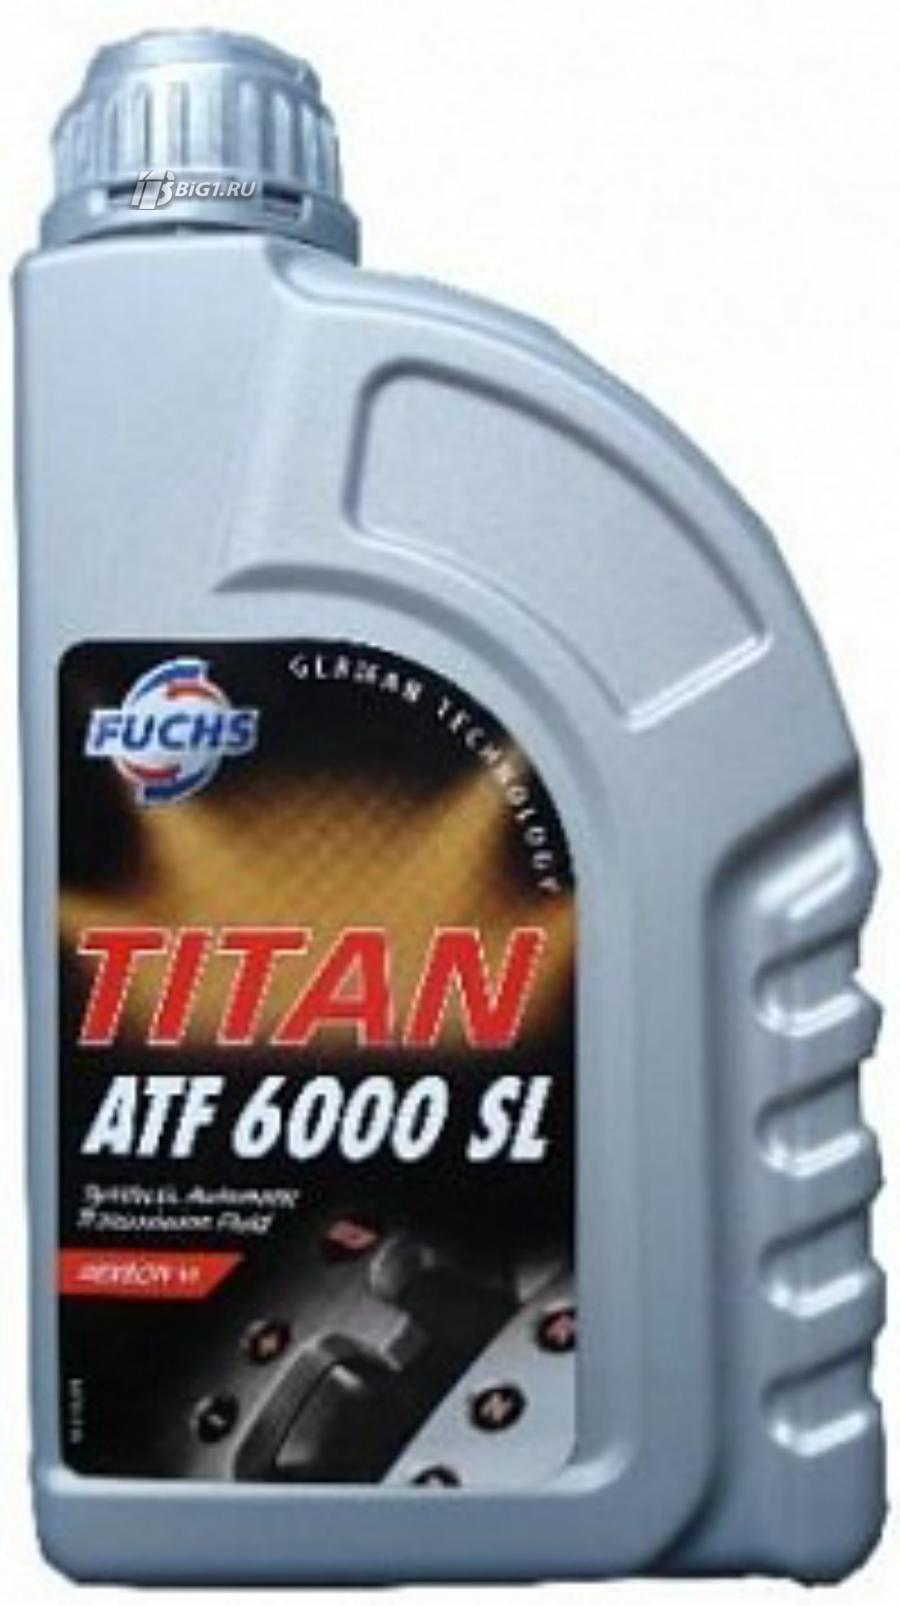 Fuchs Titan 6000 SL